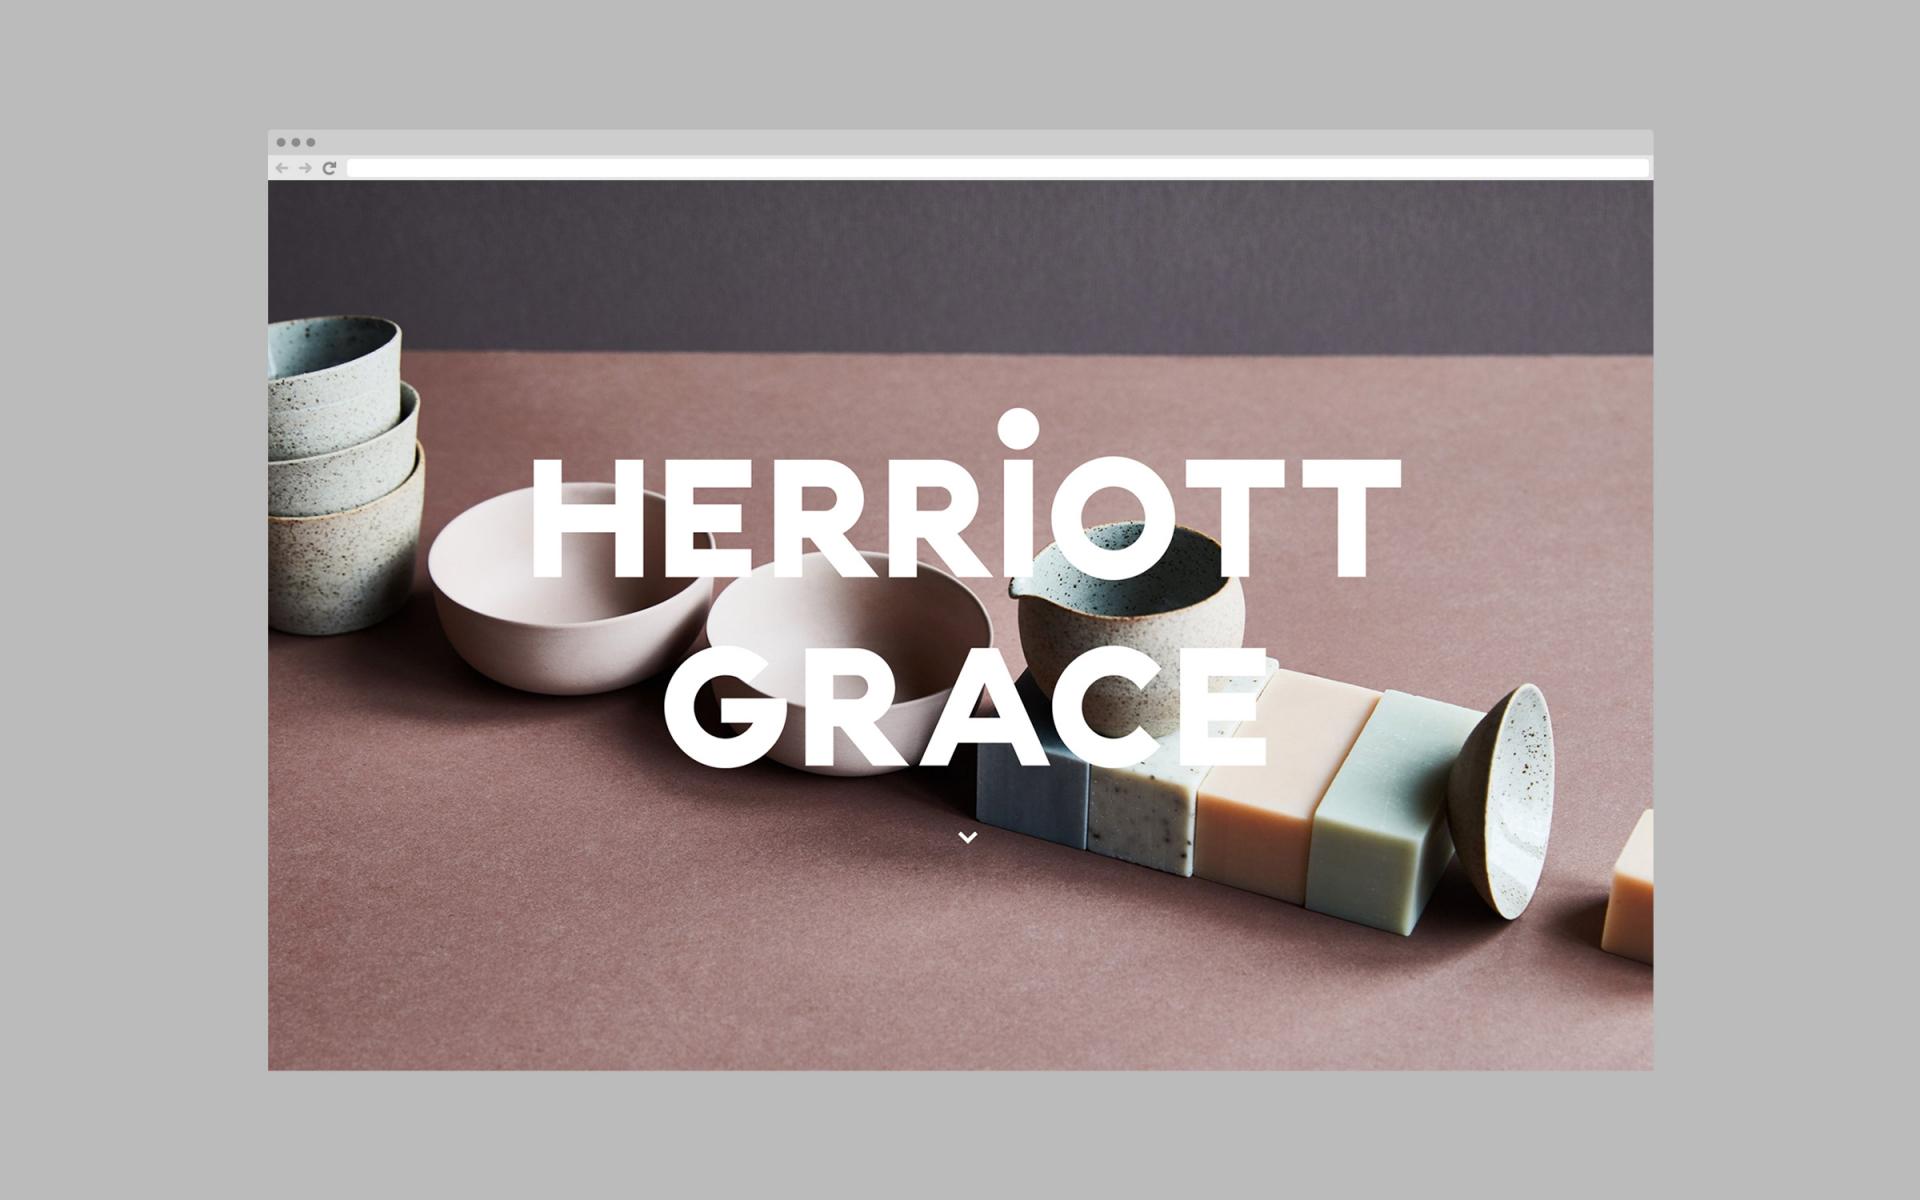 idesign tung herriottgrace 01